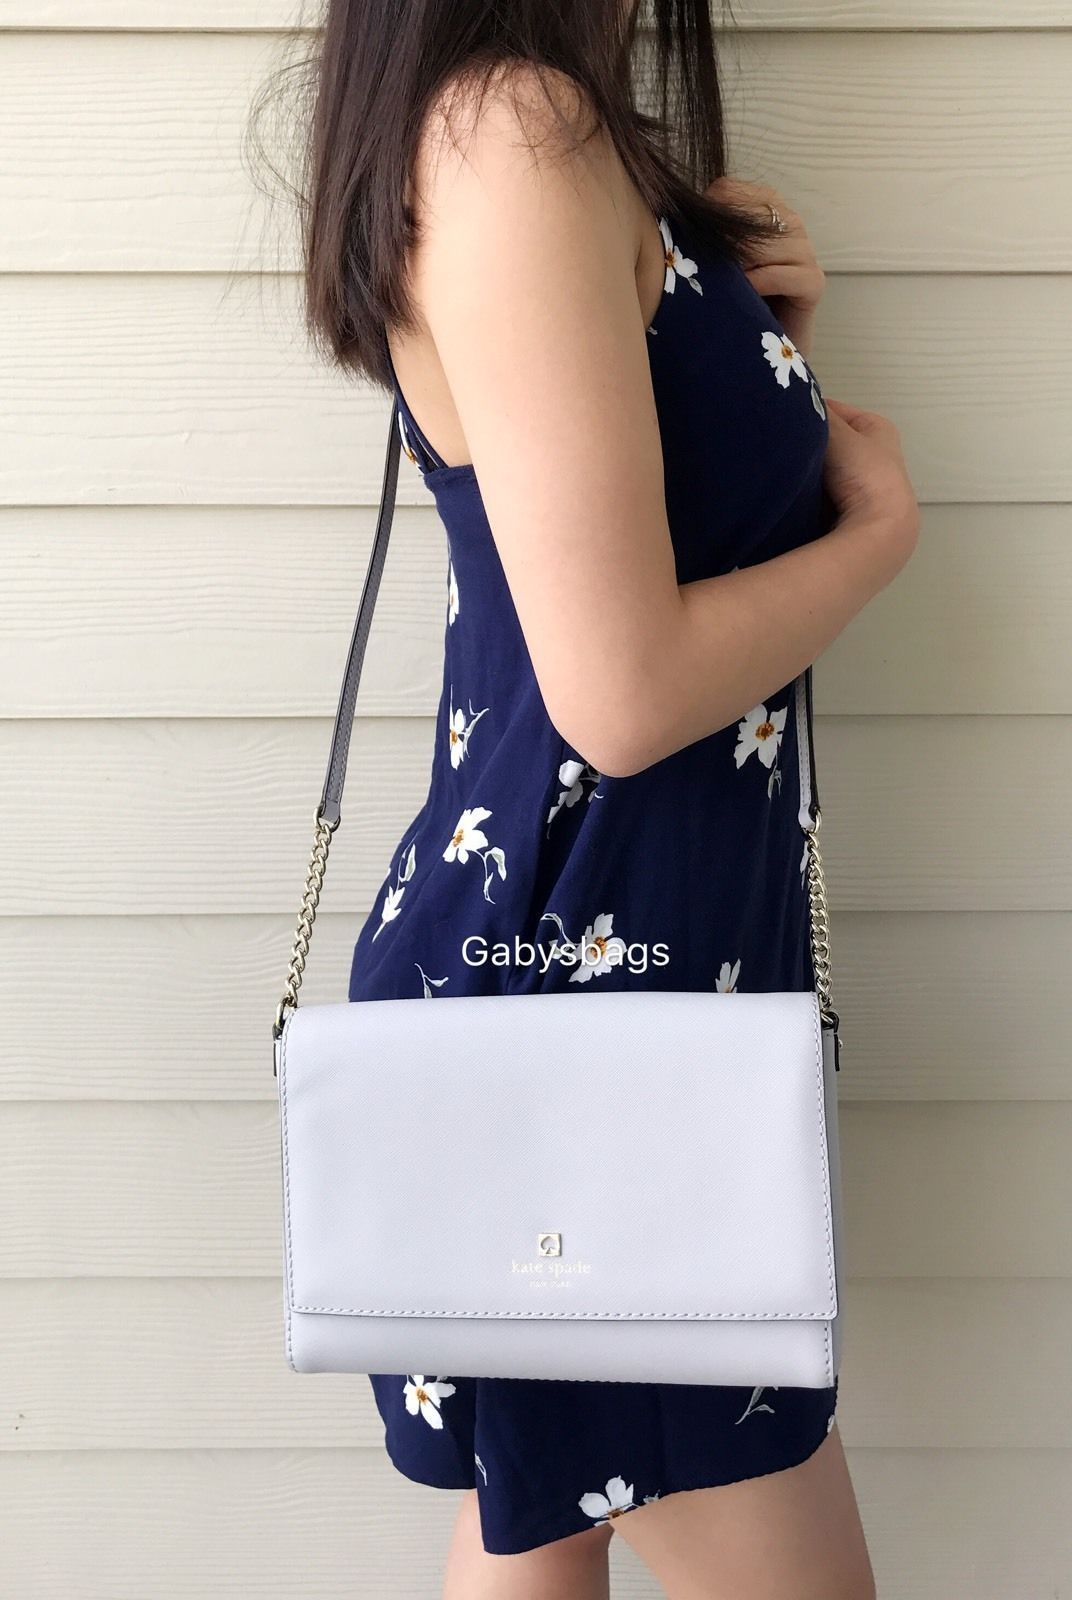 954aa350e54 S l1600. S l1600. Previous. Kate Spade Charlotte Street Alek Stoneice  Crossbody Shoulder Bag Light Gray